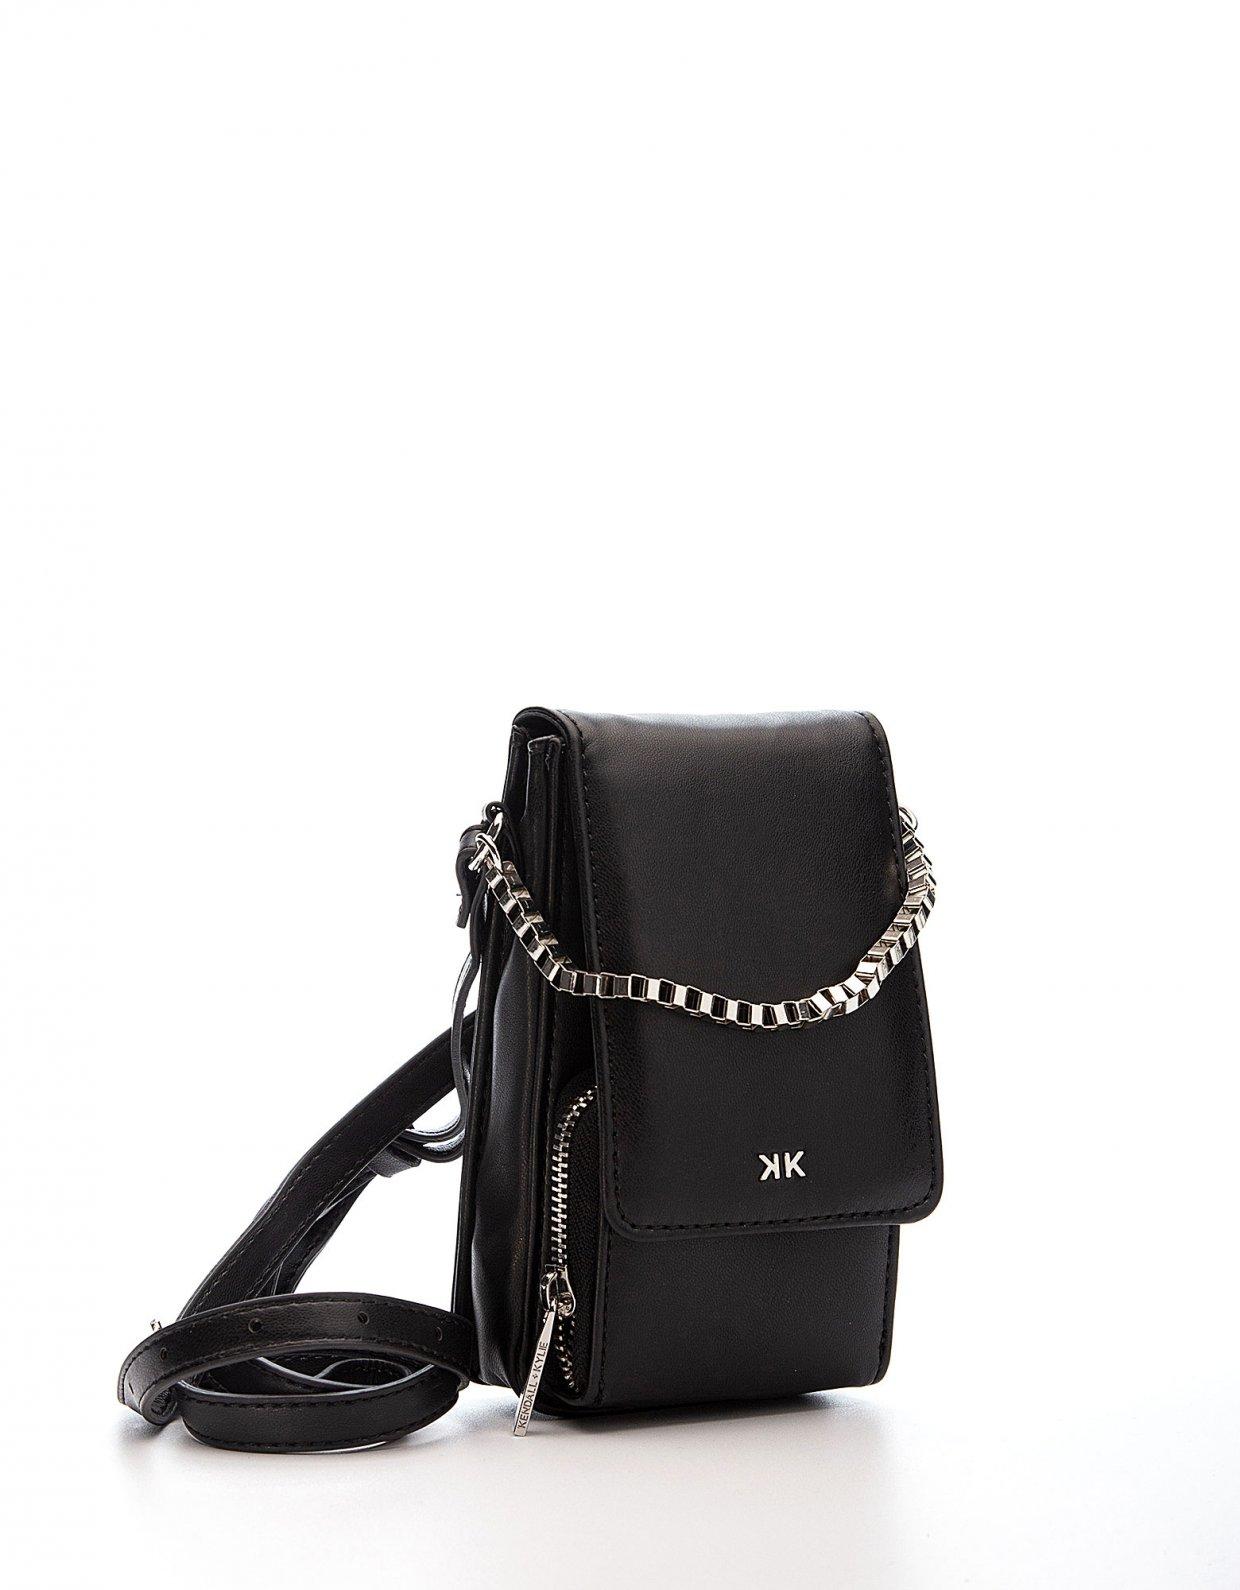 Kendall + Kylie Khloe cell phone X body black